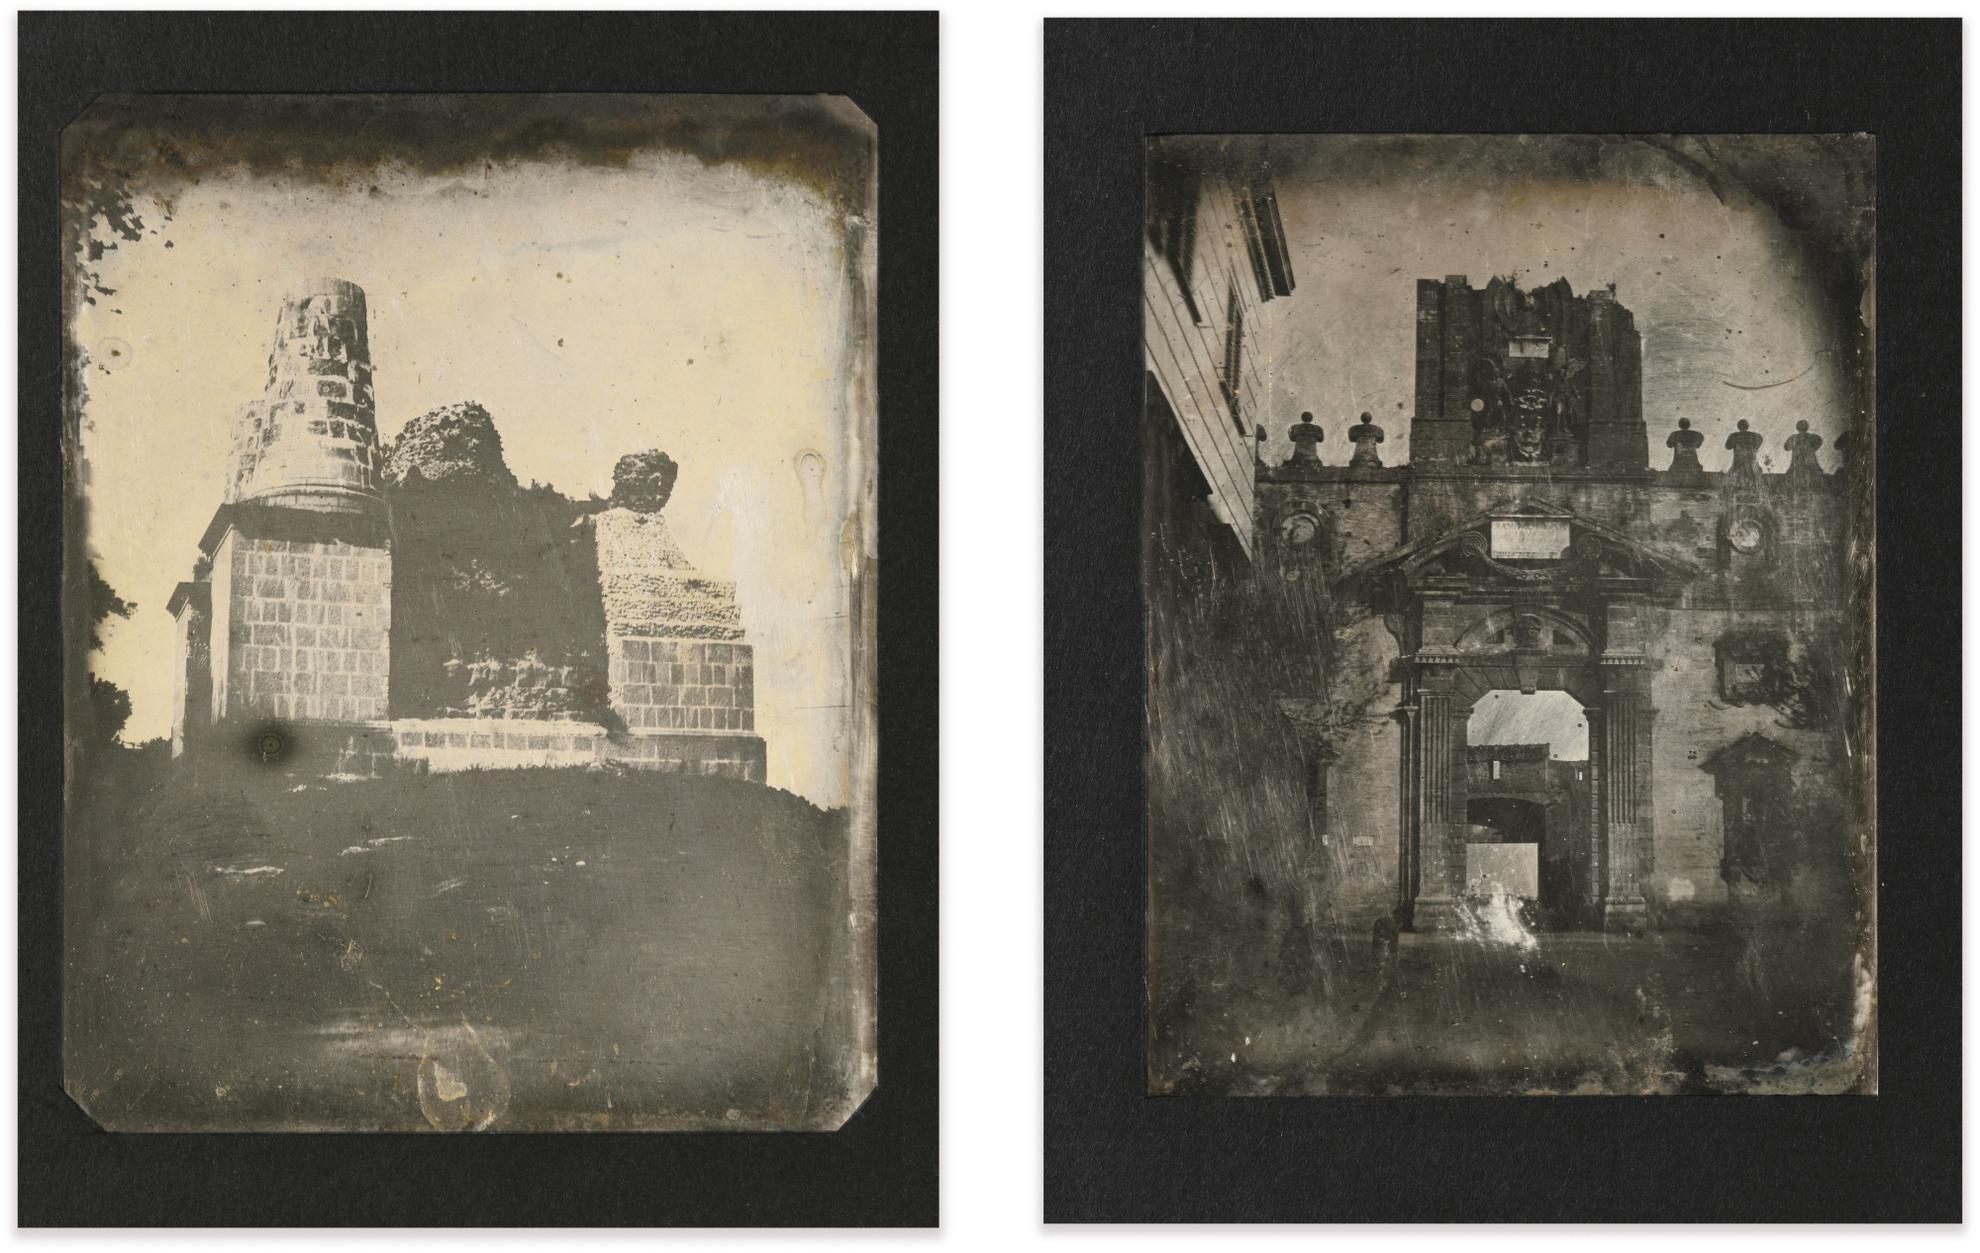 Joseph Philibert Girault De Prangey - 85. Tombeau, Albano; Porta Pia, Rome-1842